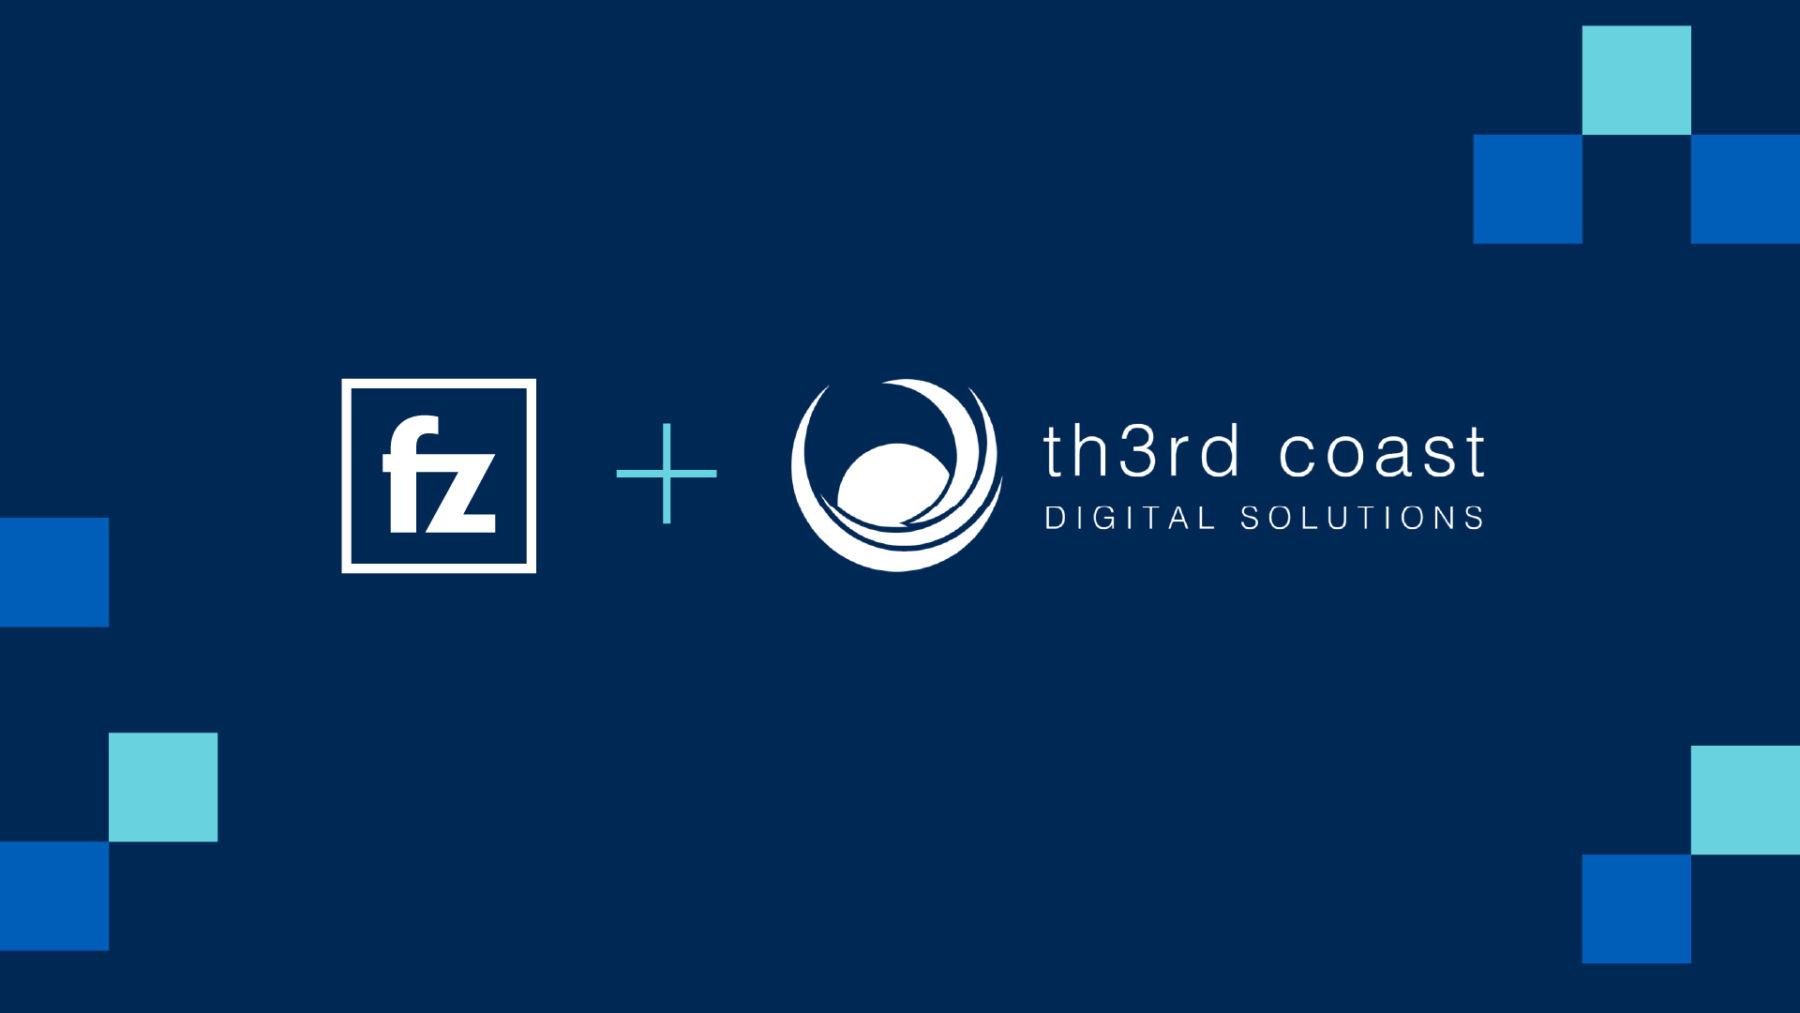 FZ + Th3rd Coast logos